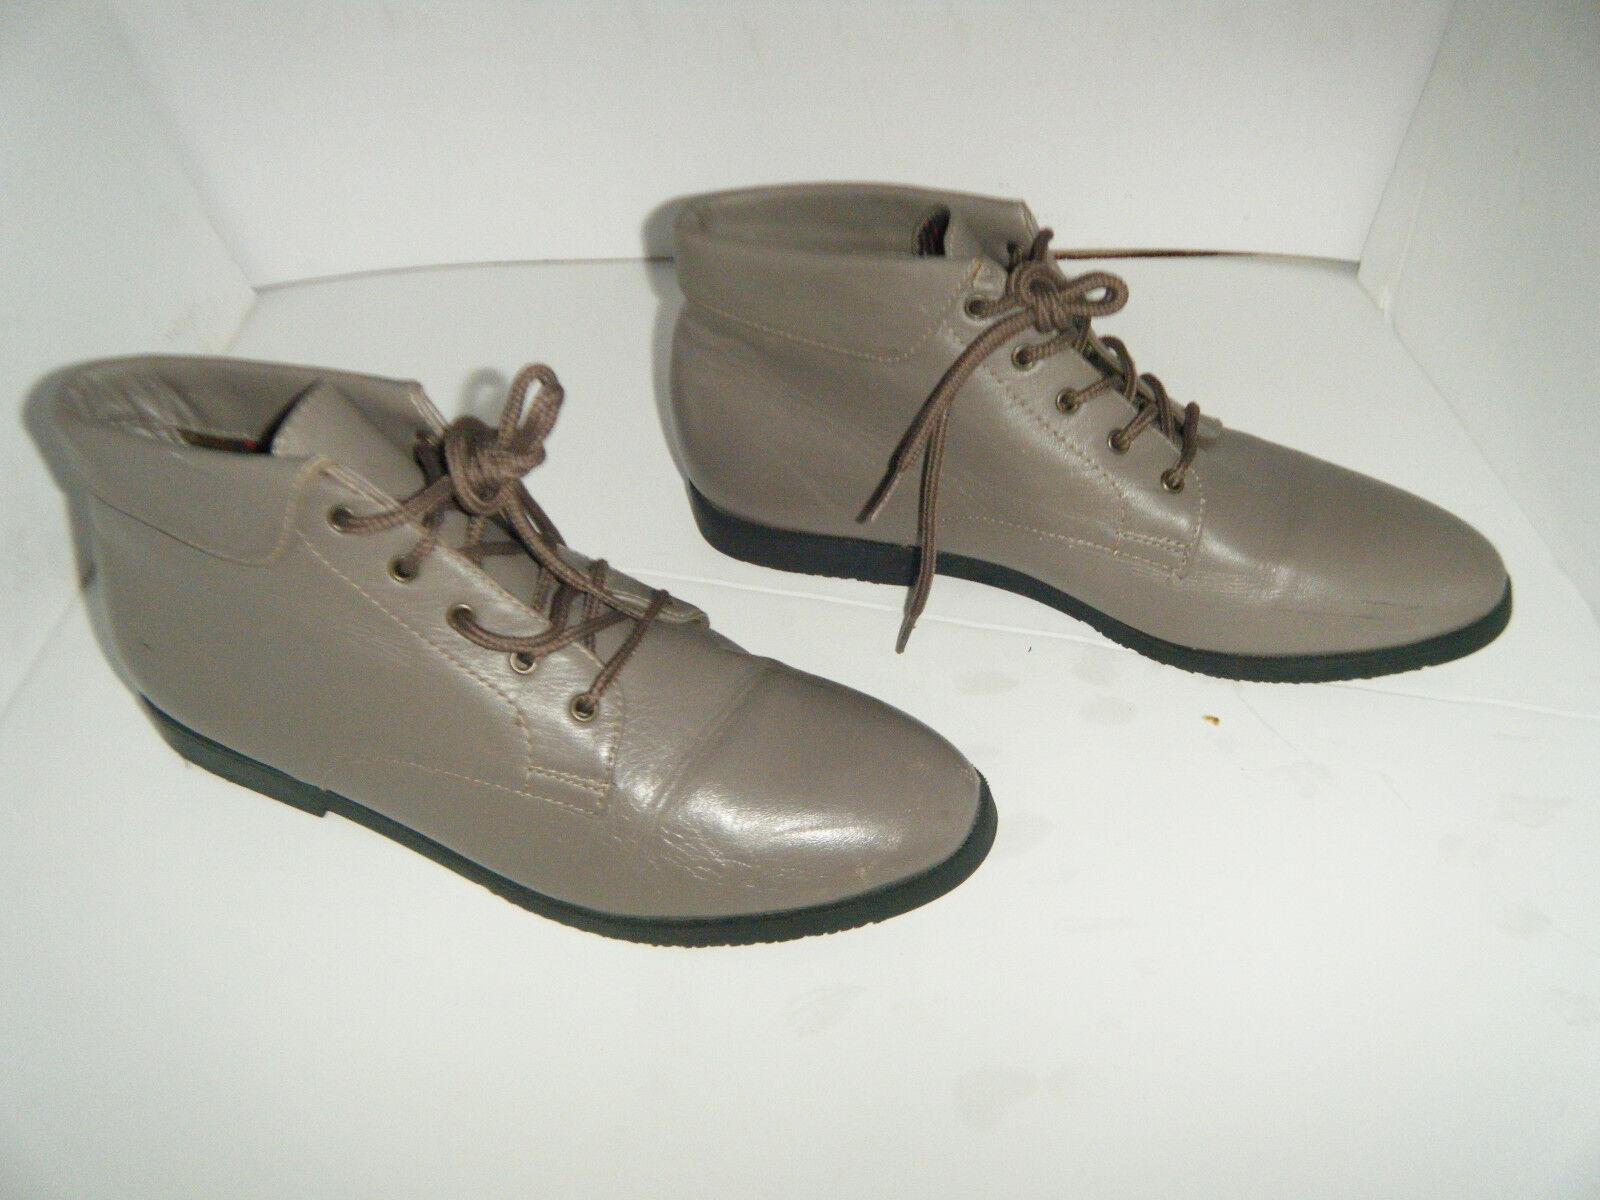 DANEXX Vintage Granny Grunge Boots Size US 6.5 M Women's